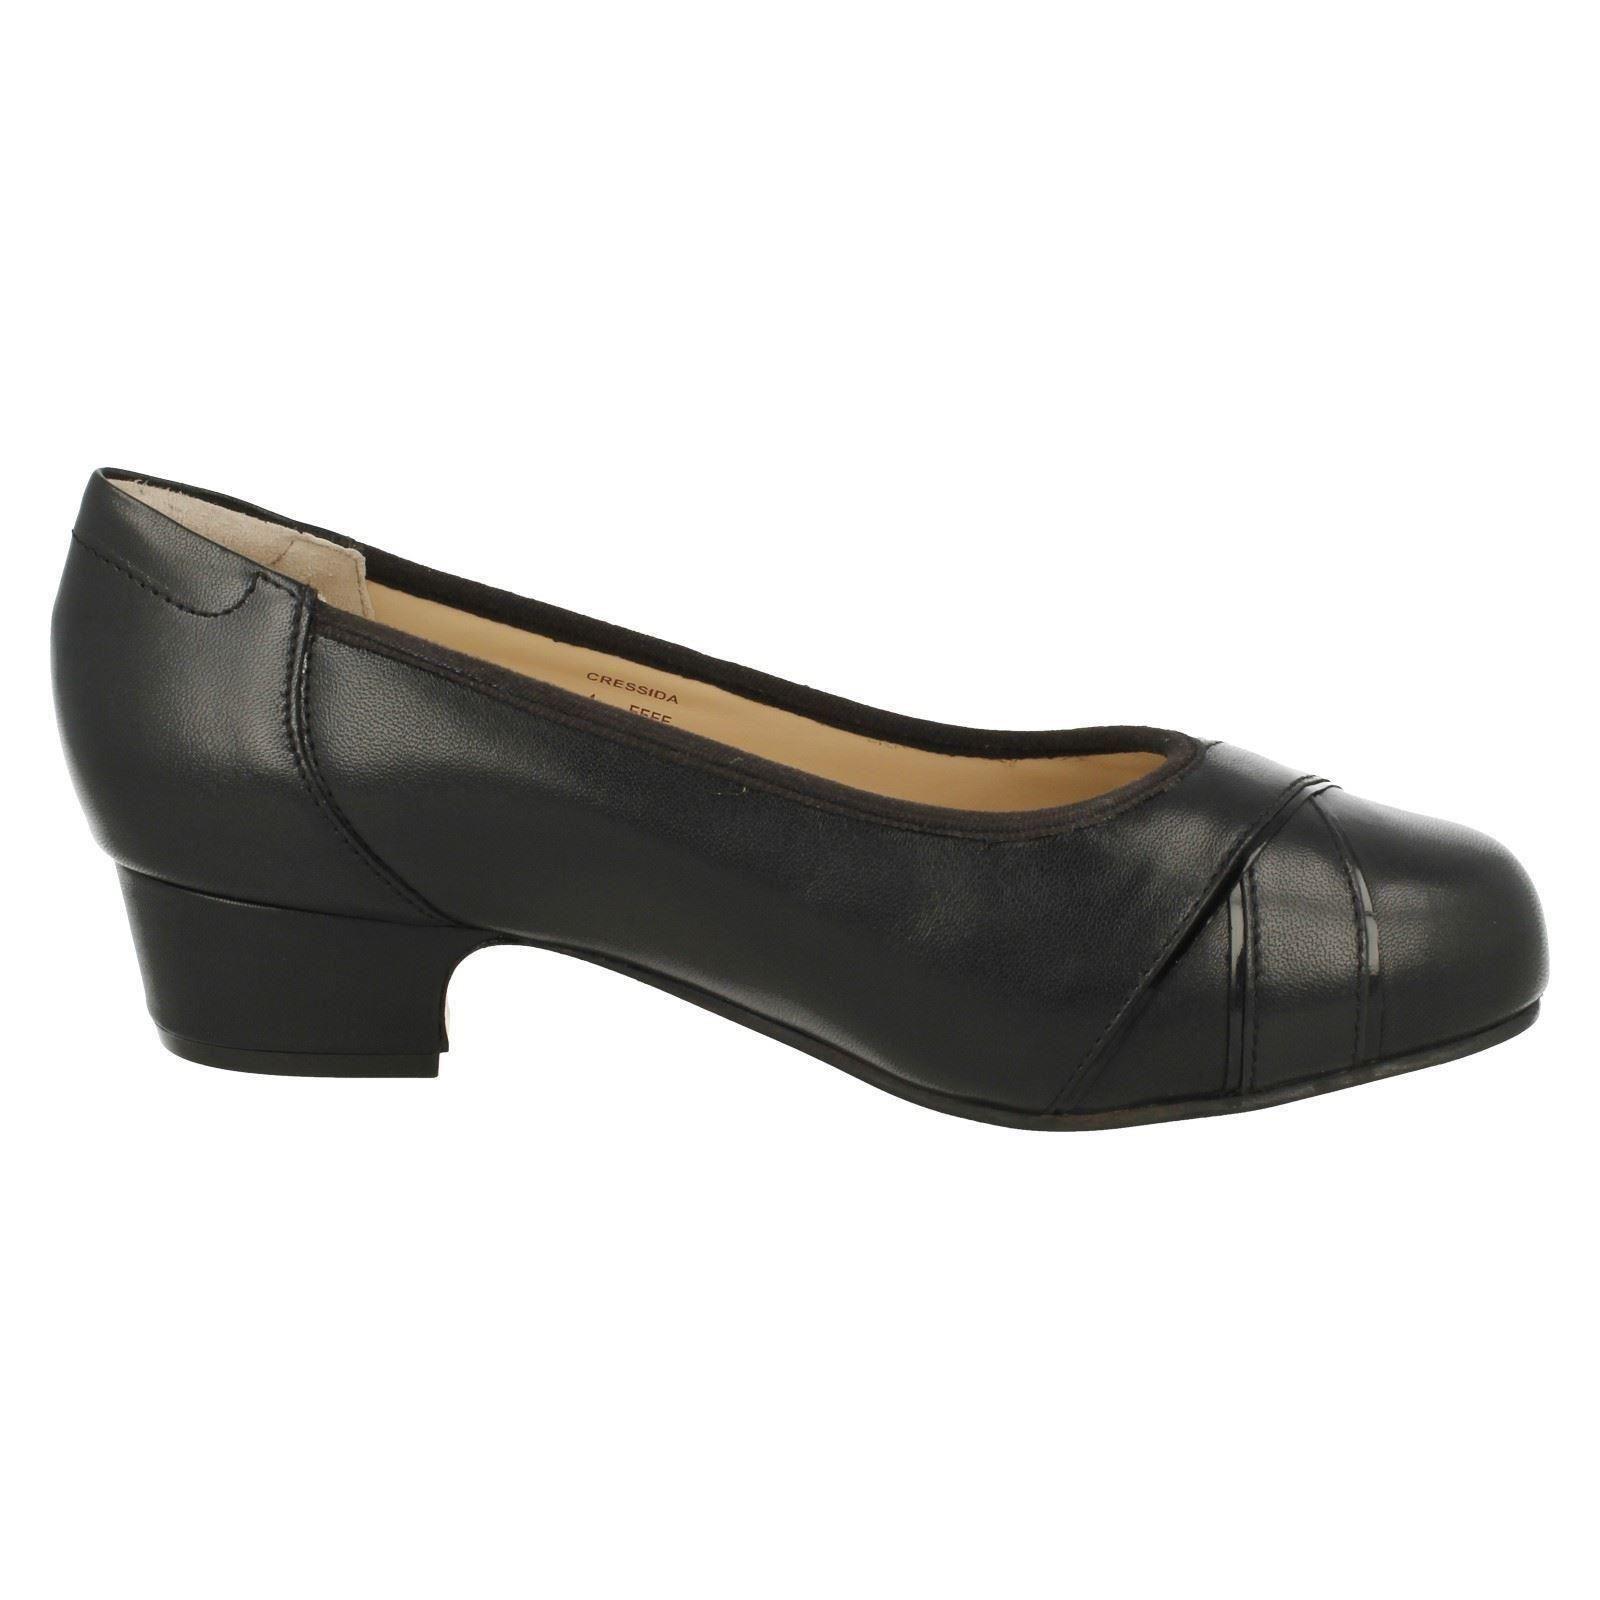 Ladies Equity Wide Fit Low Heel Court Shoes 'Cressida'